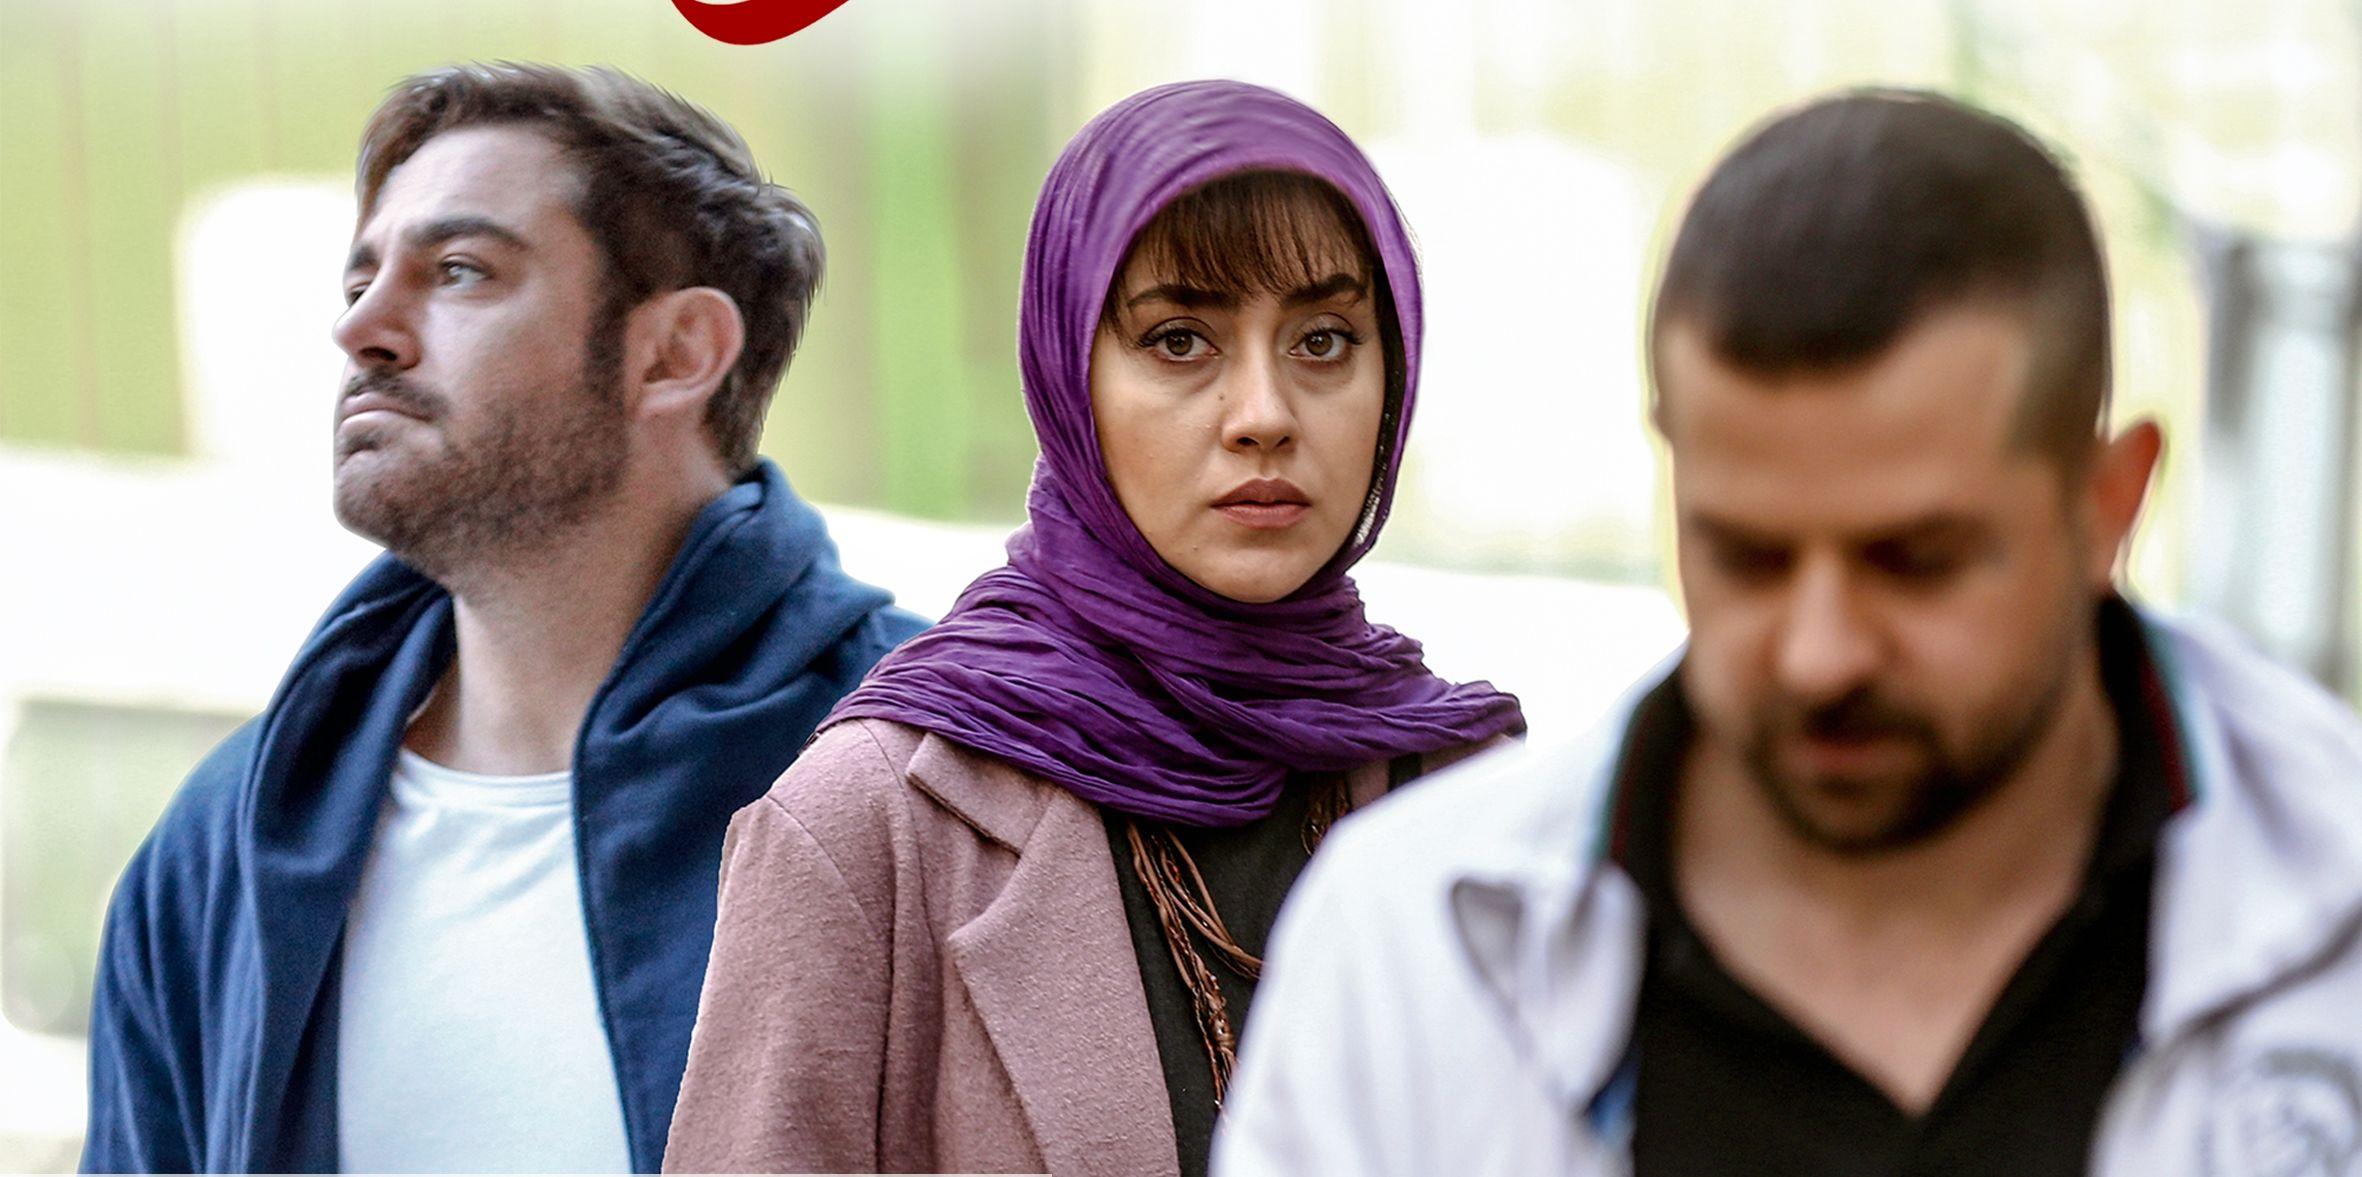 بهاره کیان افشار در سریال عاشقانه